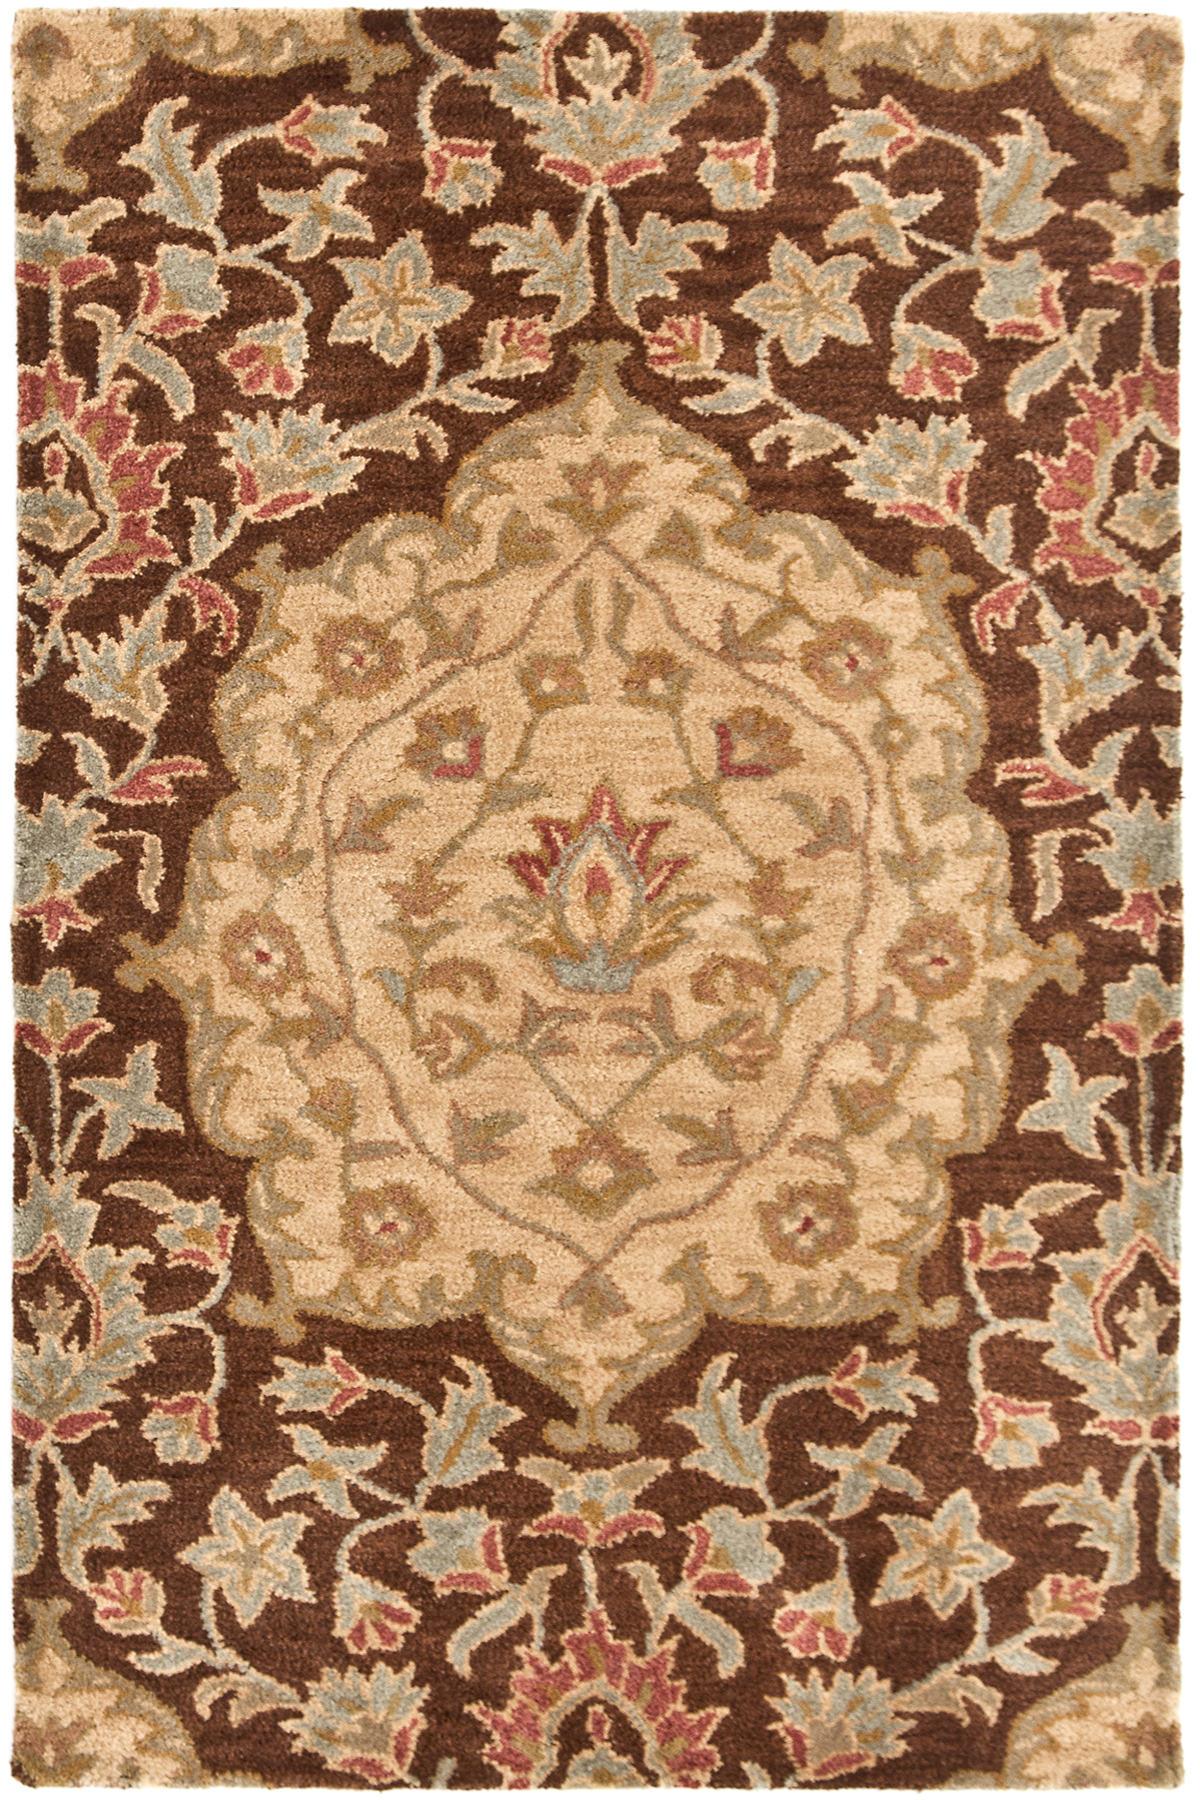 Alhambra Wool Tufted Rug